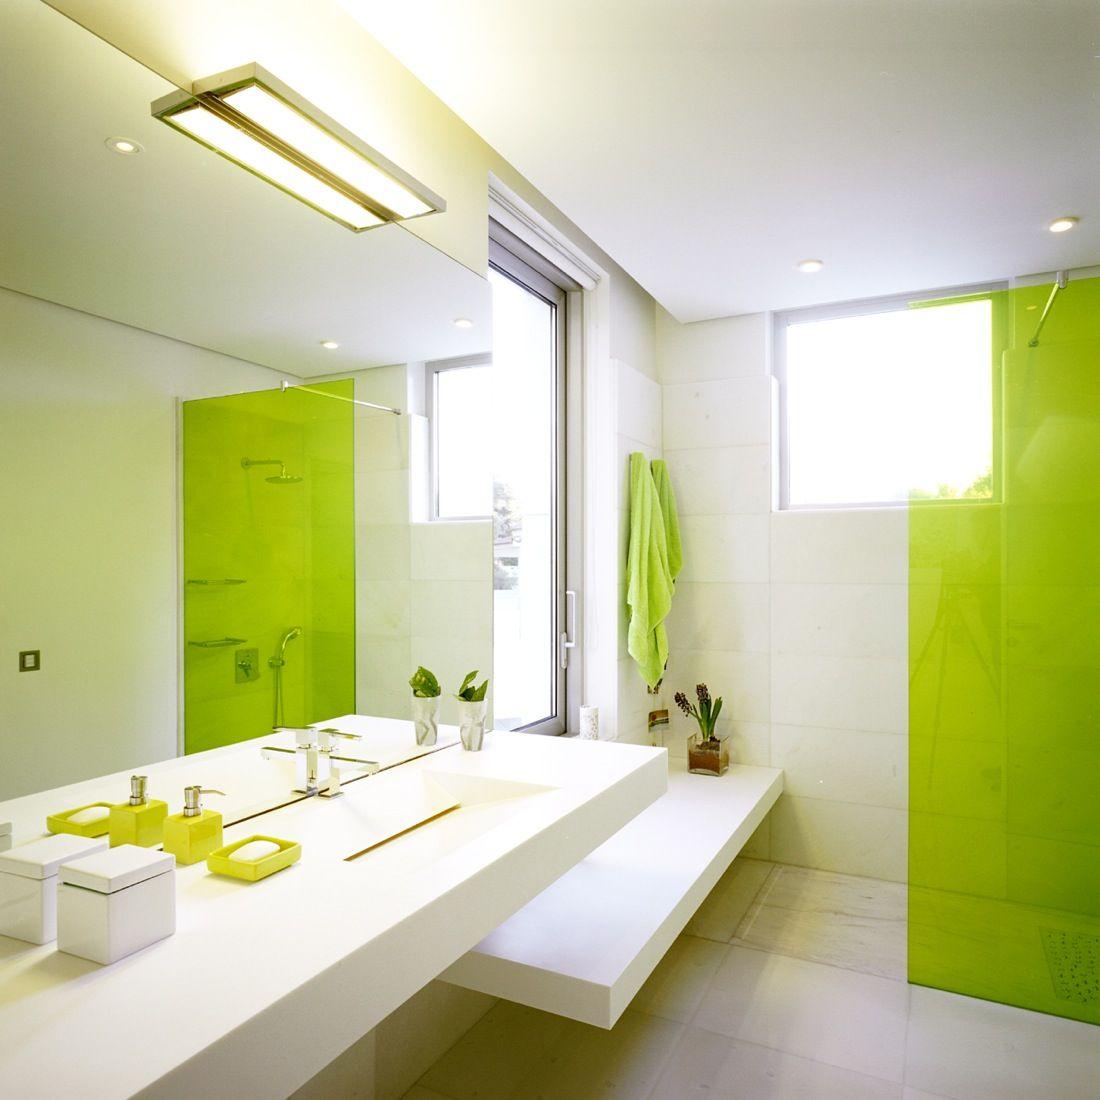 Simple bathroom interior design ideas – Sipping your way to